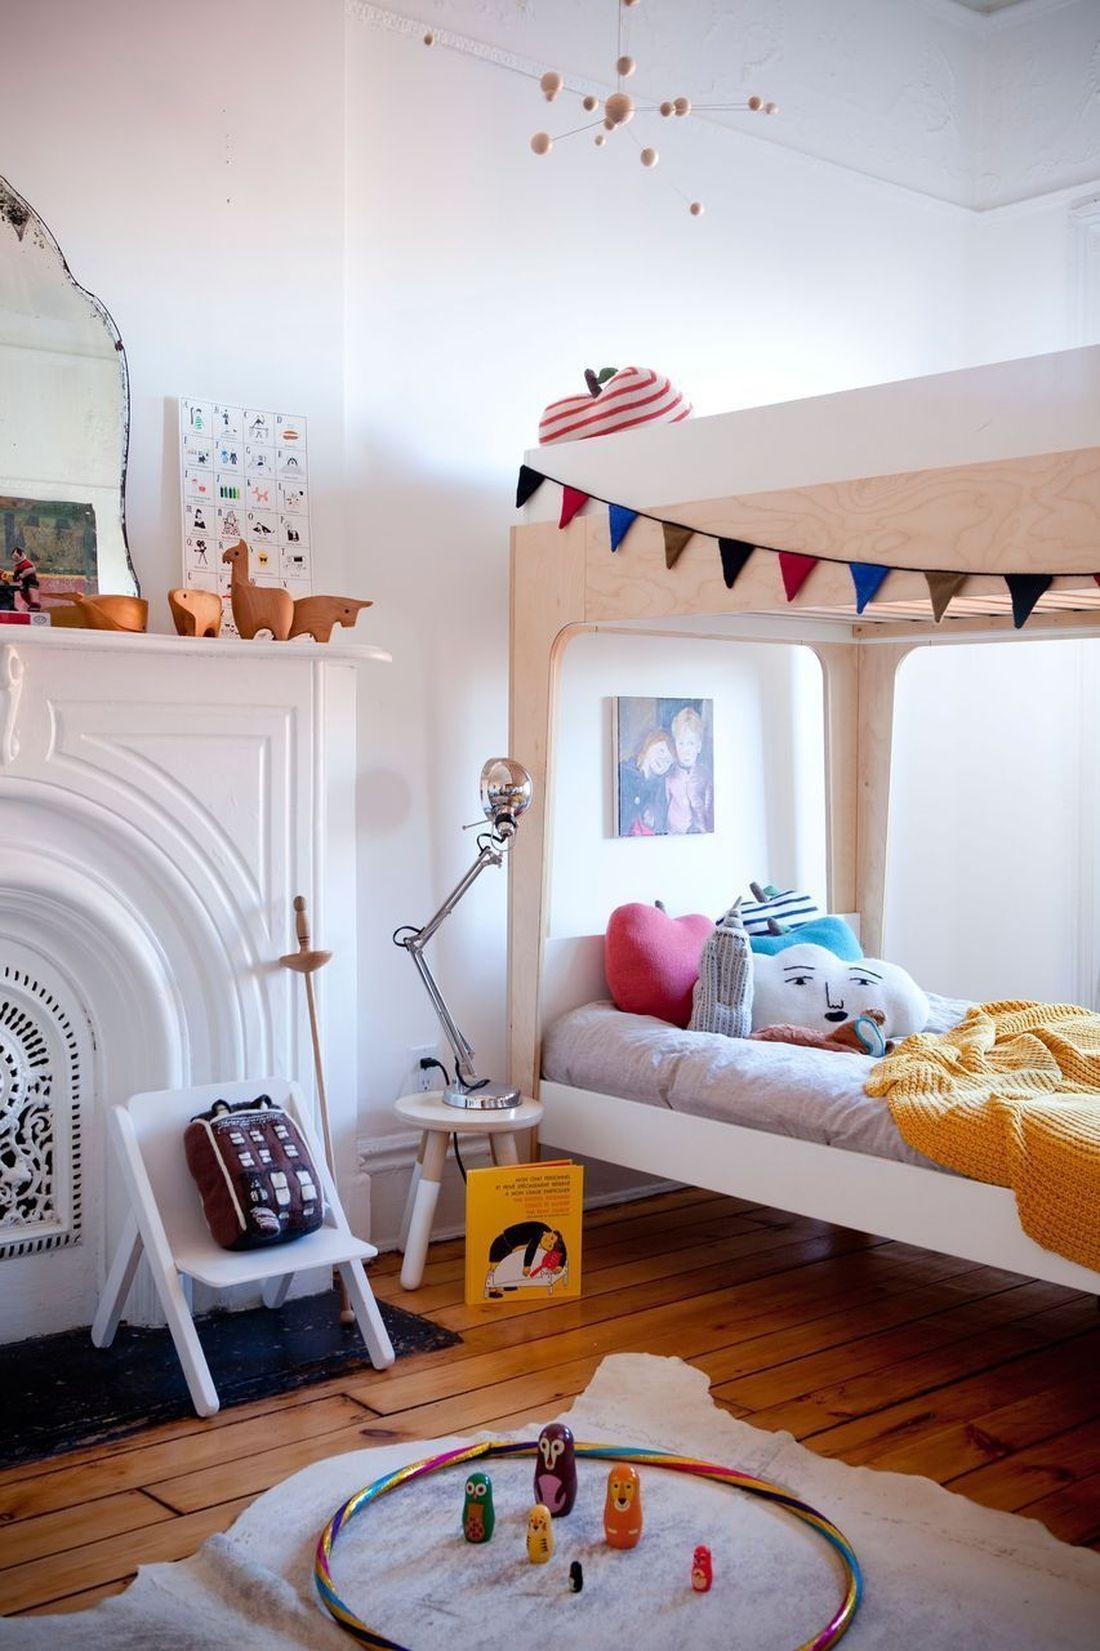 oeuf hochbett etagenbett perch 90x200cm wei birke oeuf komplettzimmer kinderzimmer. Black Bedroom Furniture Sets. Home Design Ideas